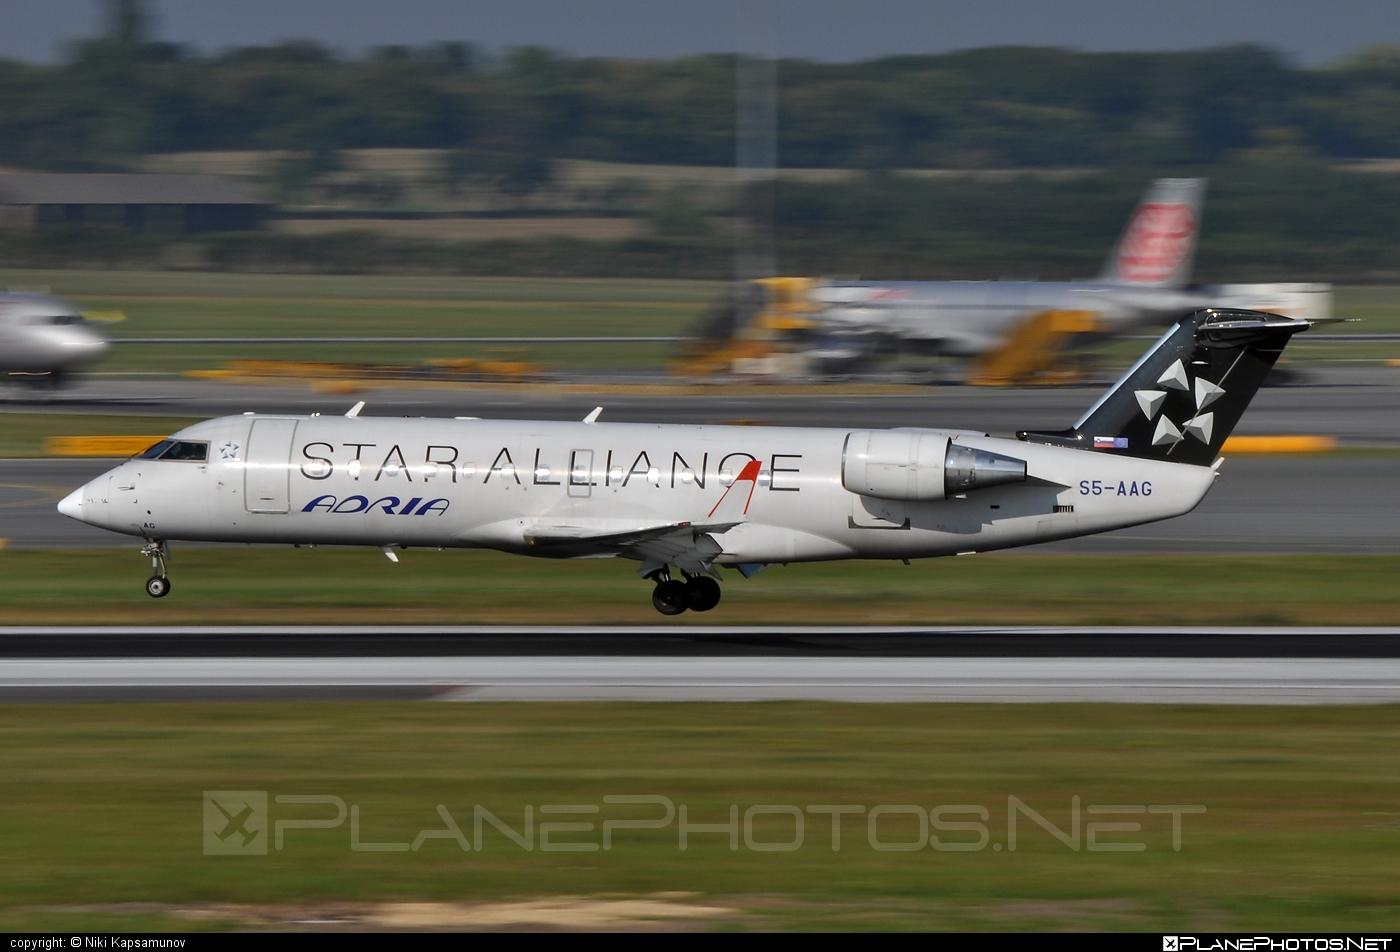 Bombardier CRJ200LR - S5-AAG operated by Adria Airways #bombardier #bombardiercrj #bombardiercrj200 #bombardiercrj200lr #crj200 #crj200lr #staralliance